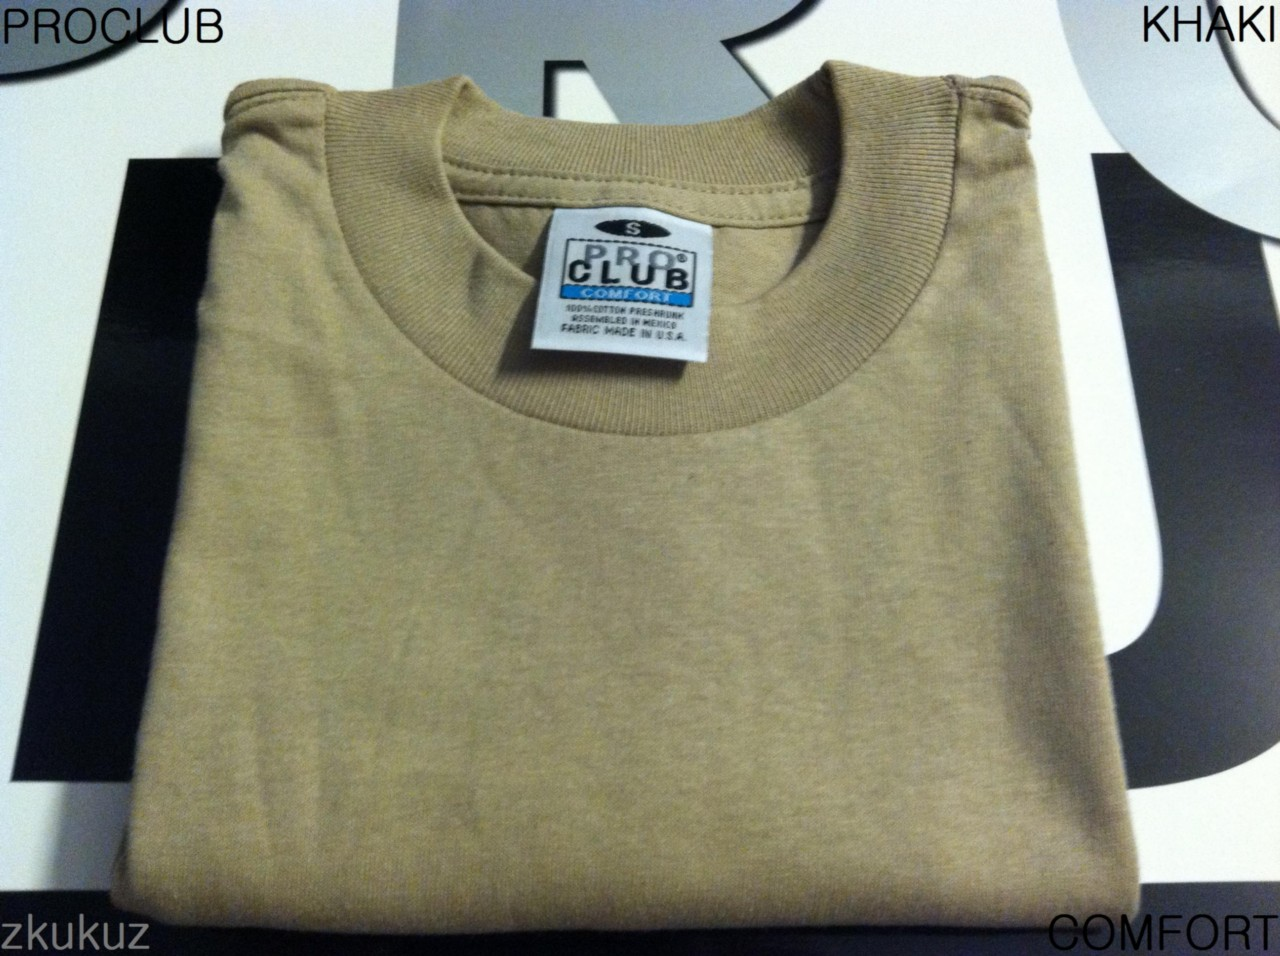 d339fe61 Cheap Pro Club Heavyweight T Shirts